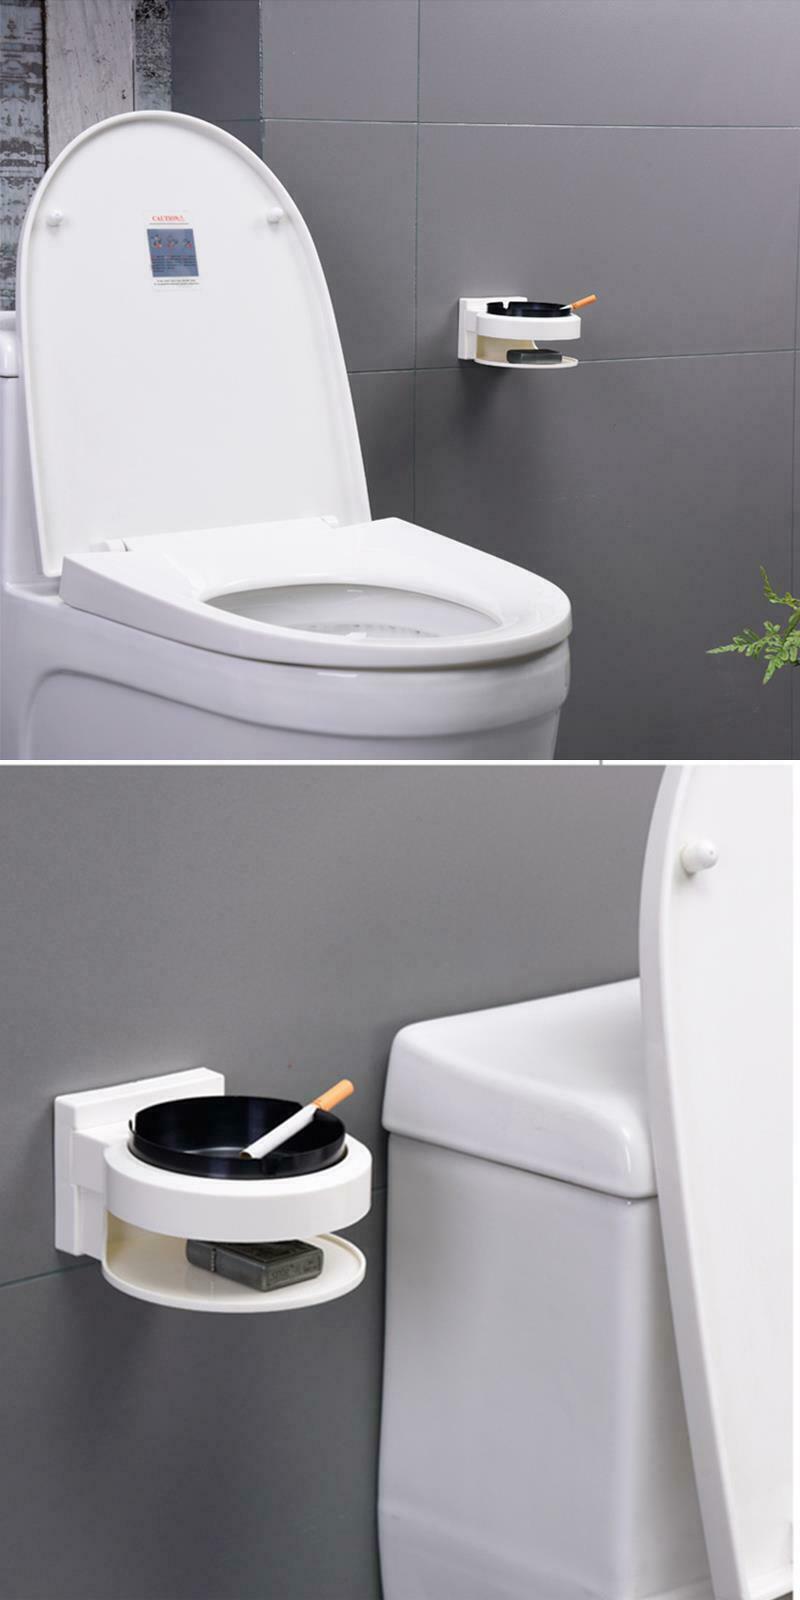 Stainless Steel Ashtray Creative Wall Mounted Bathroom Ash Storage Portable Box image 8